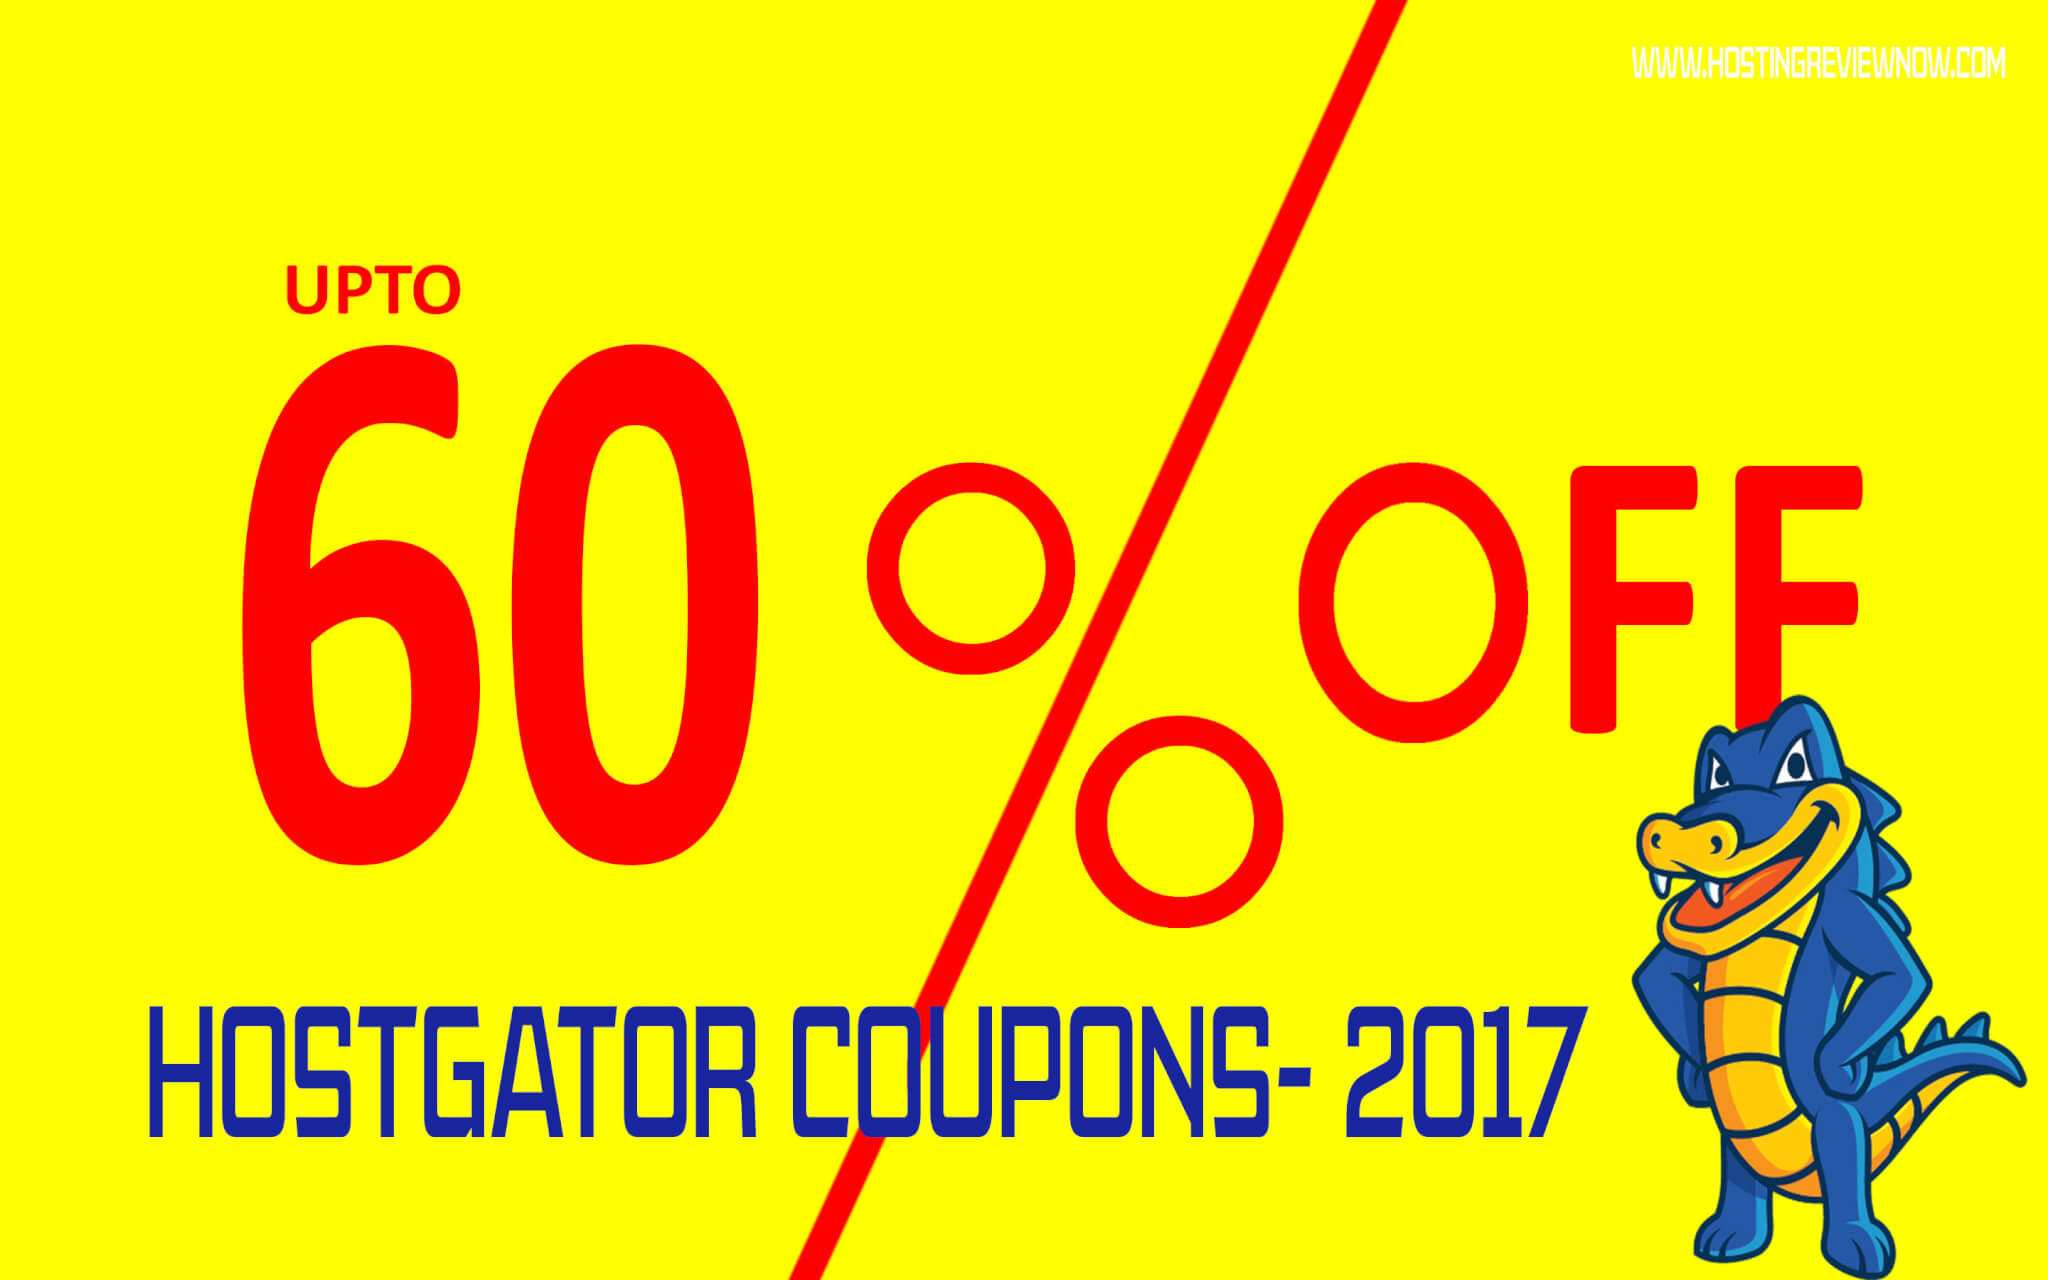 hostgator coupon code 2017